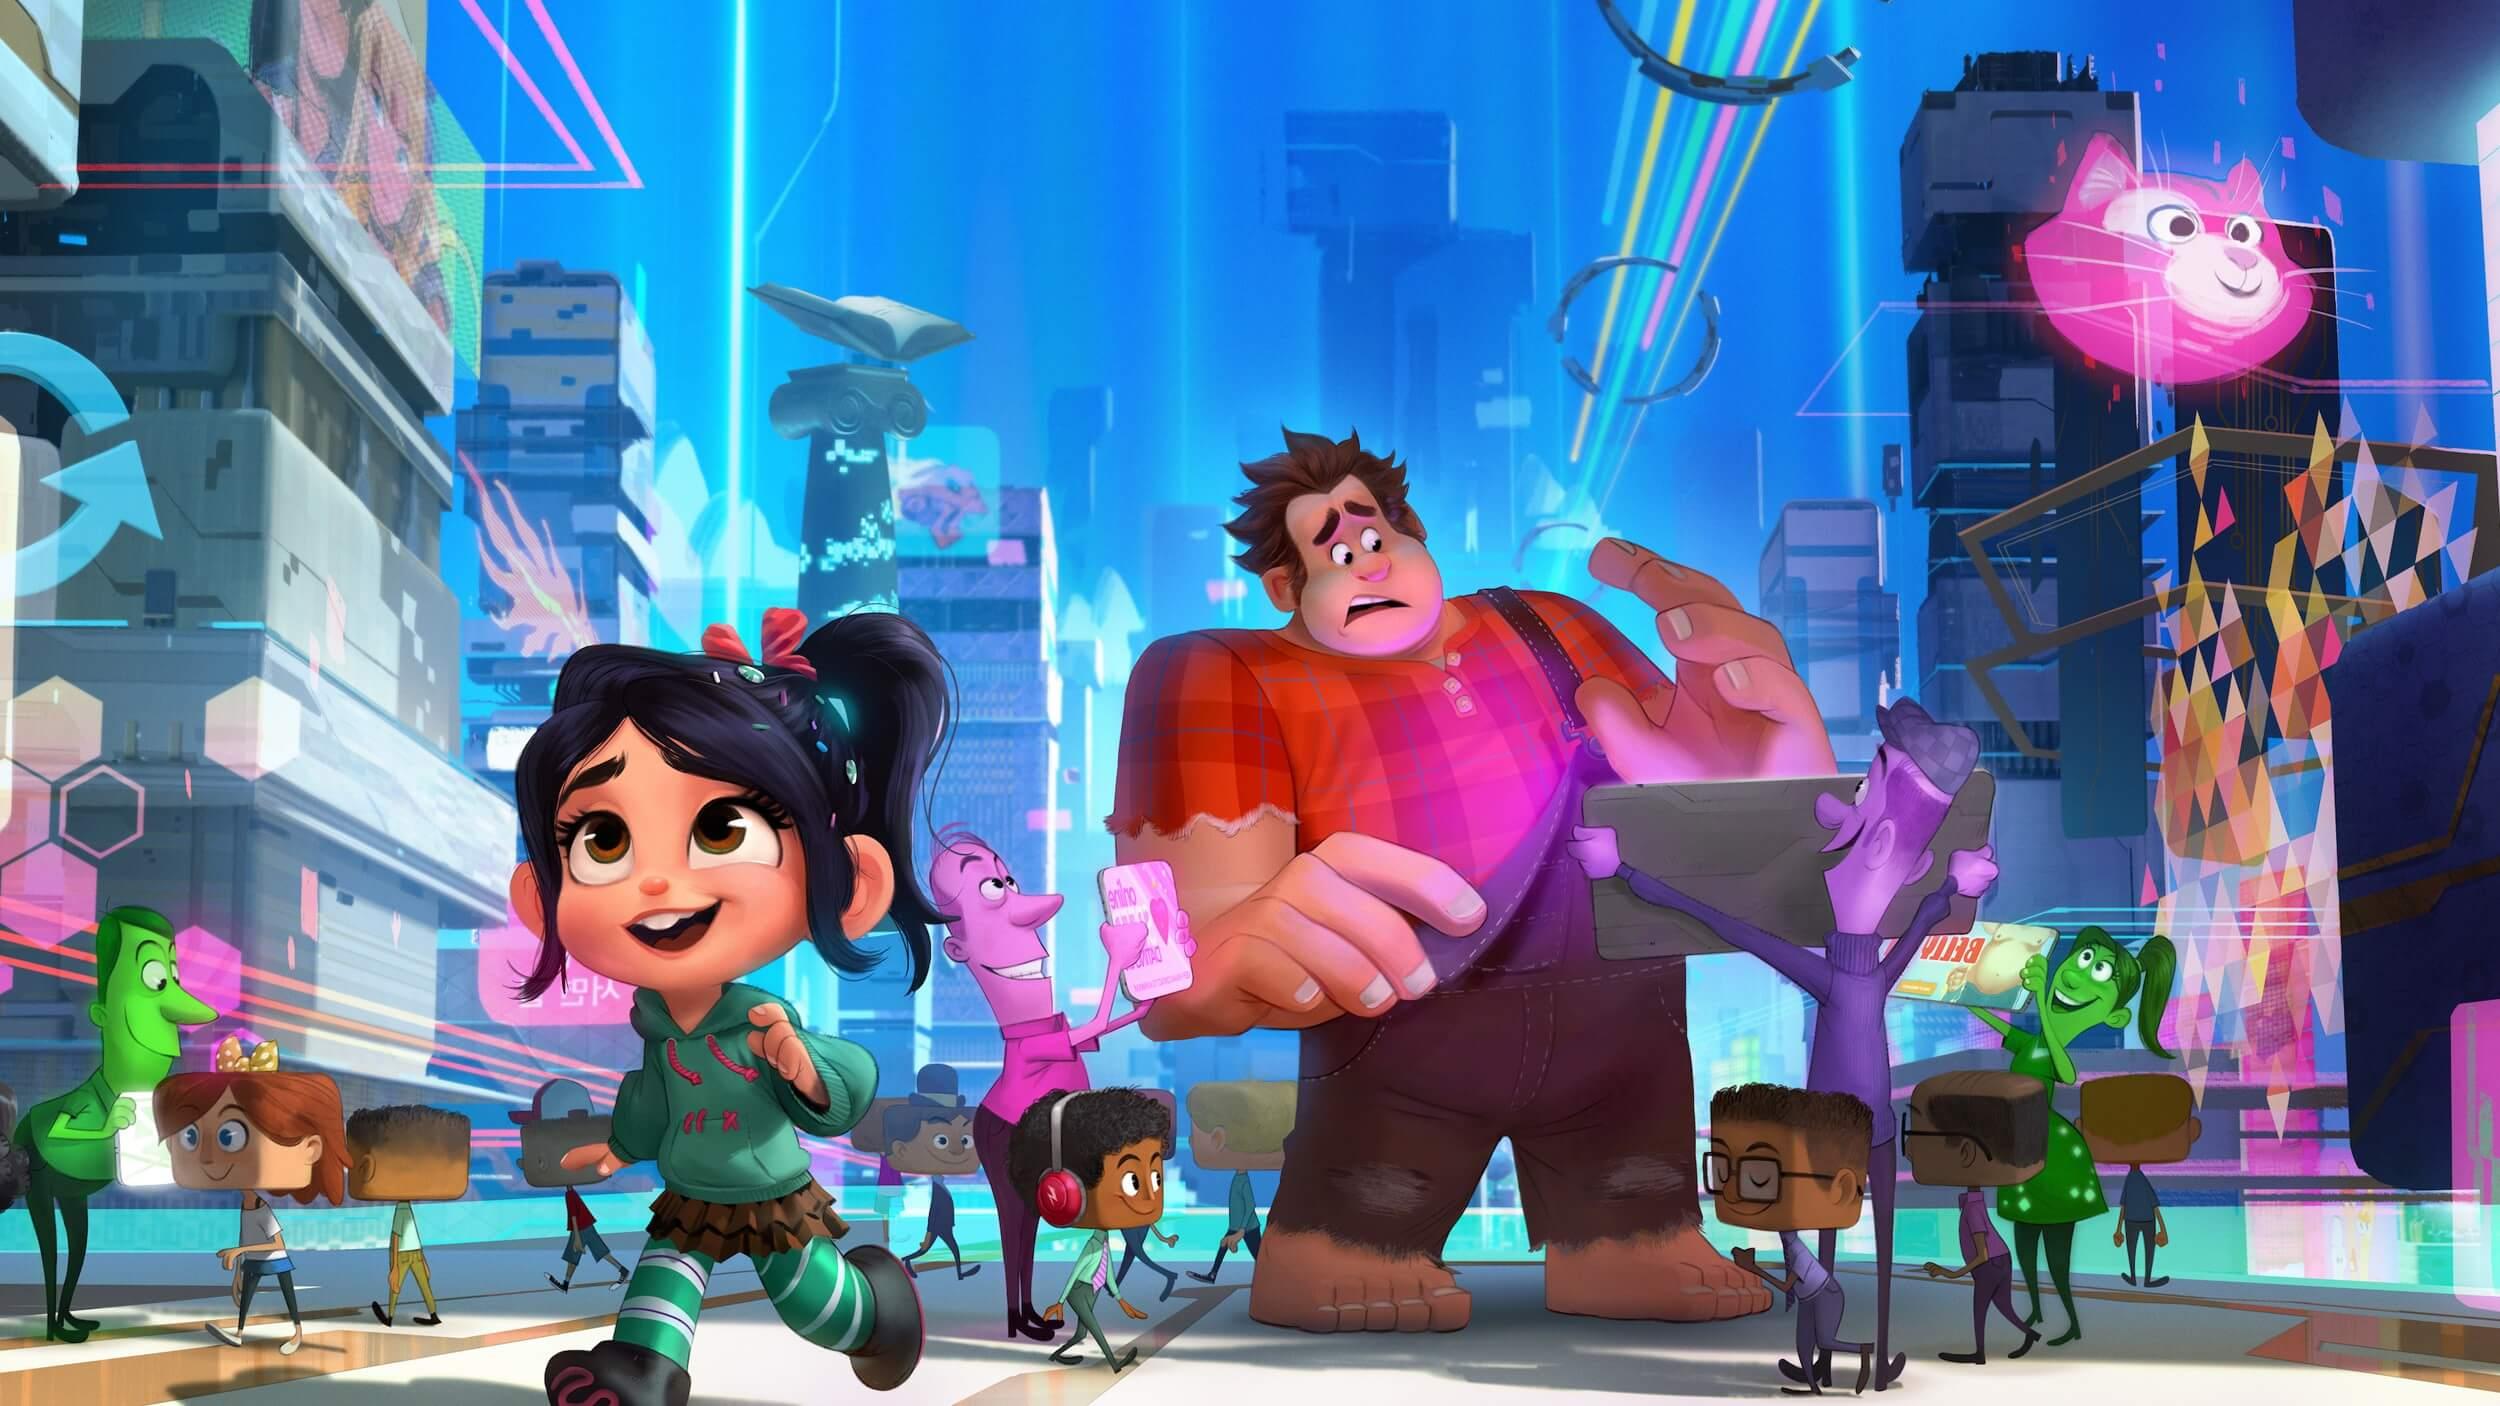 Wreck-It Ralph 2 Trailers Many Disney Disney, Marvel